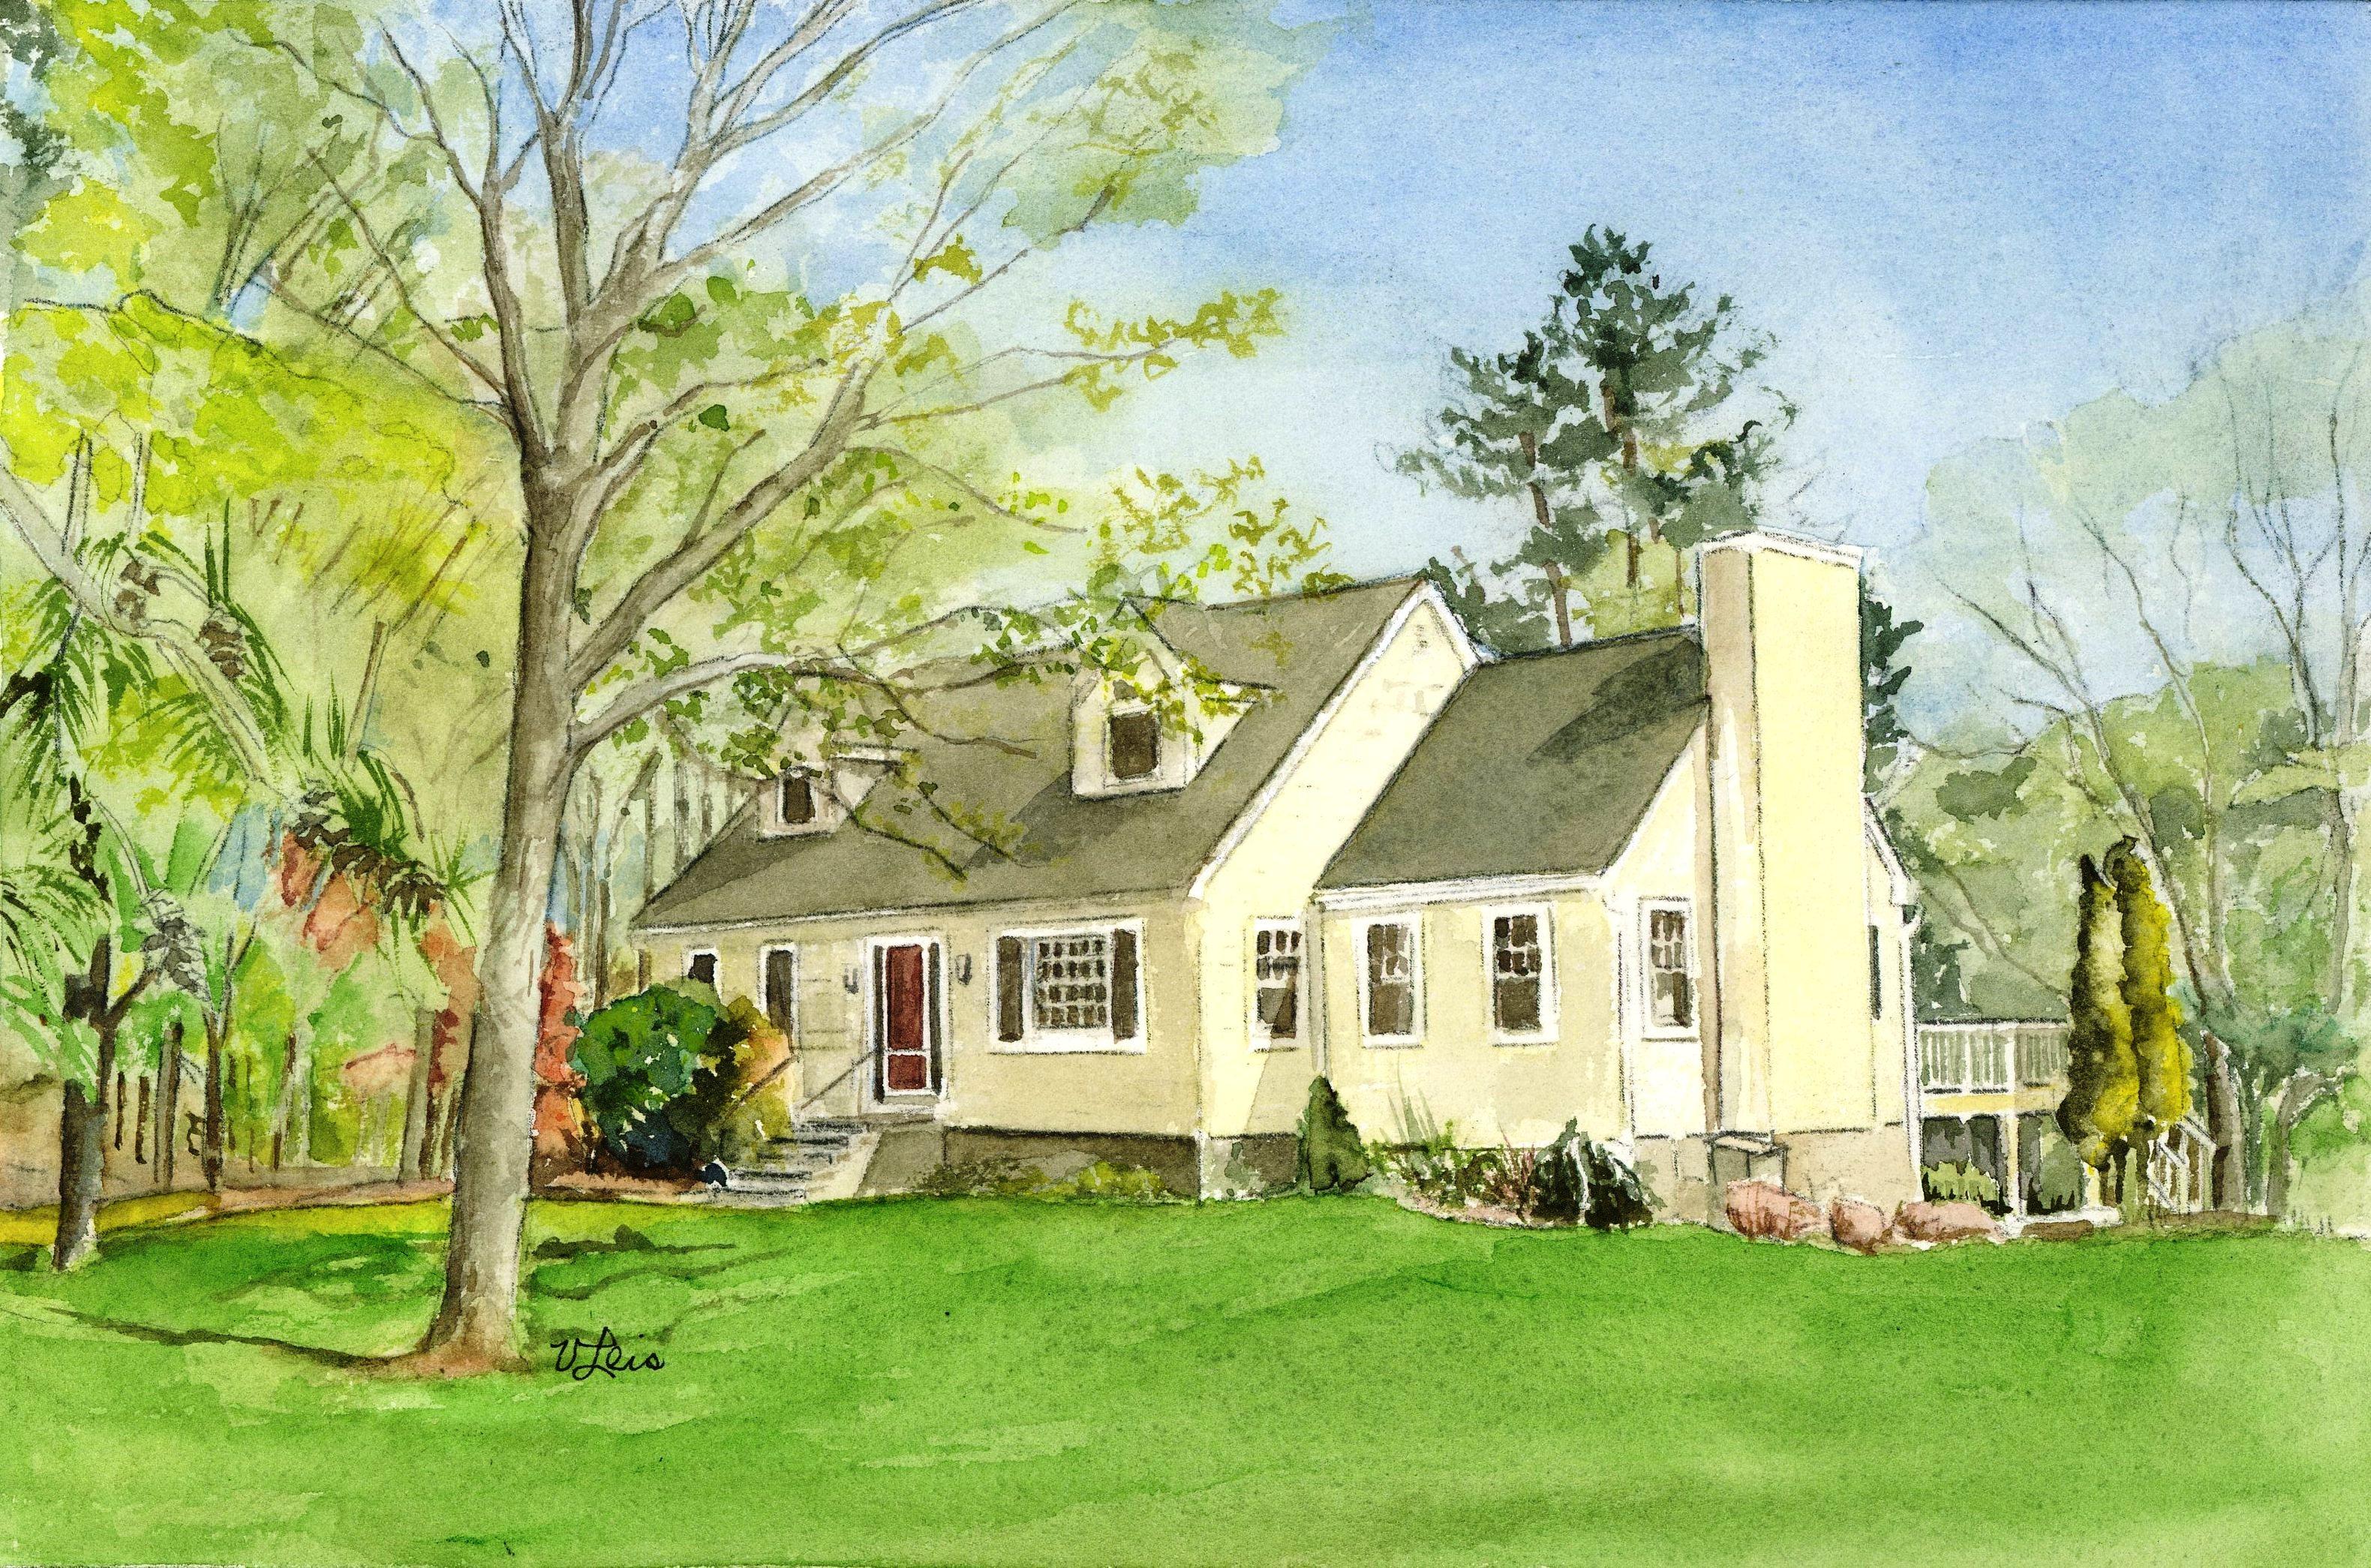 独户住宅 为 销售 在 Sweet Country Home 4 Pine Lane Mahopac, 纽约州 10541 美国